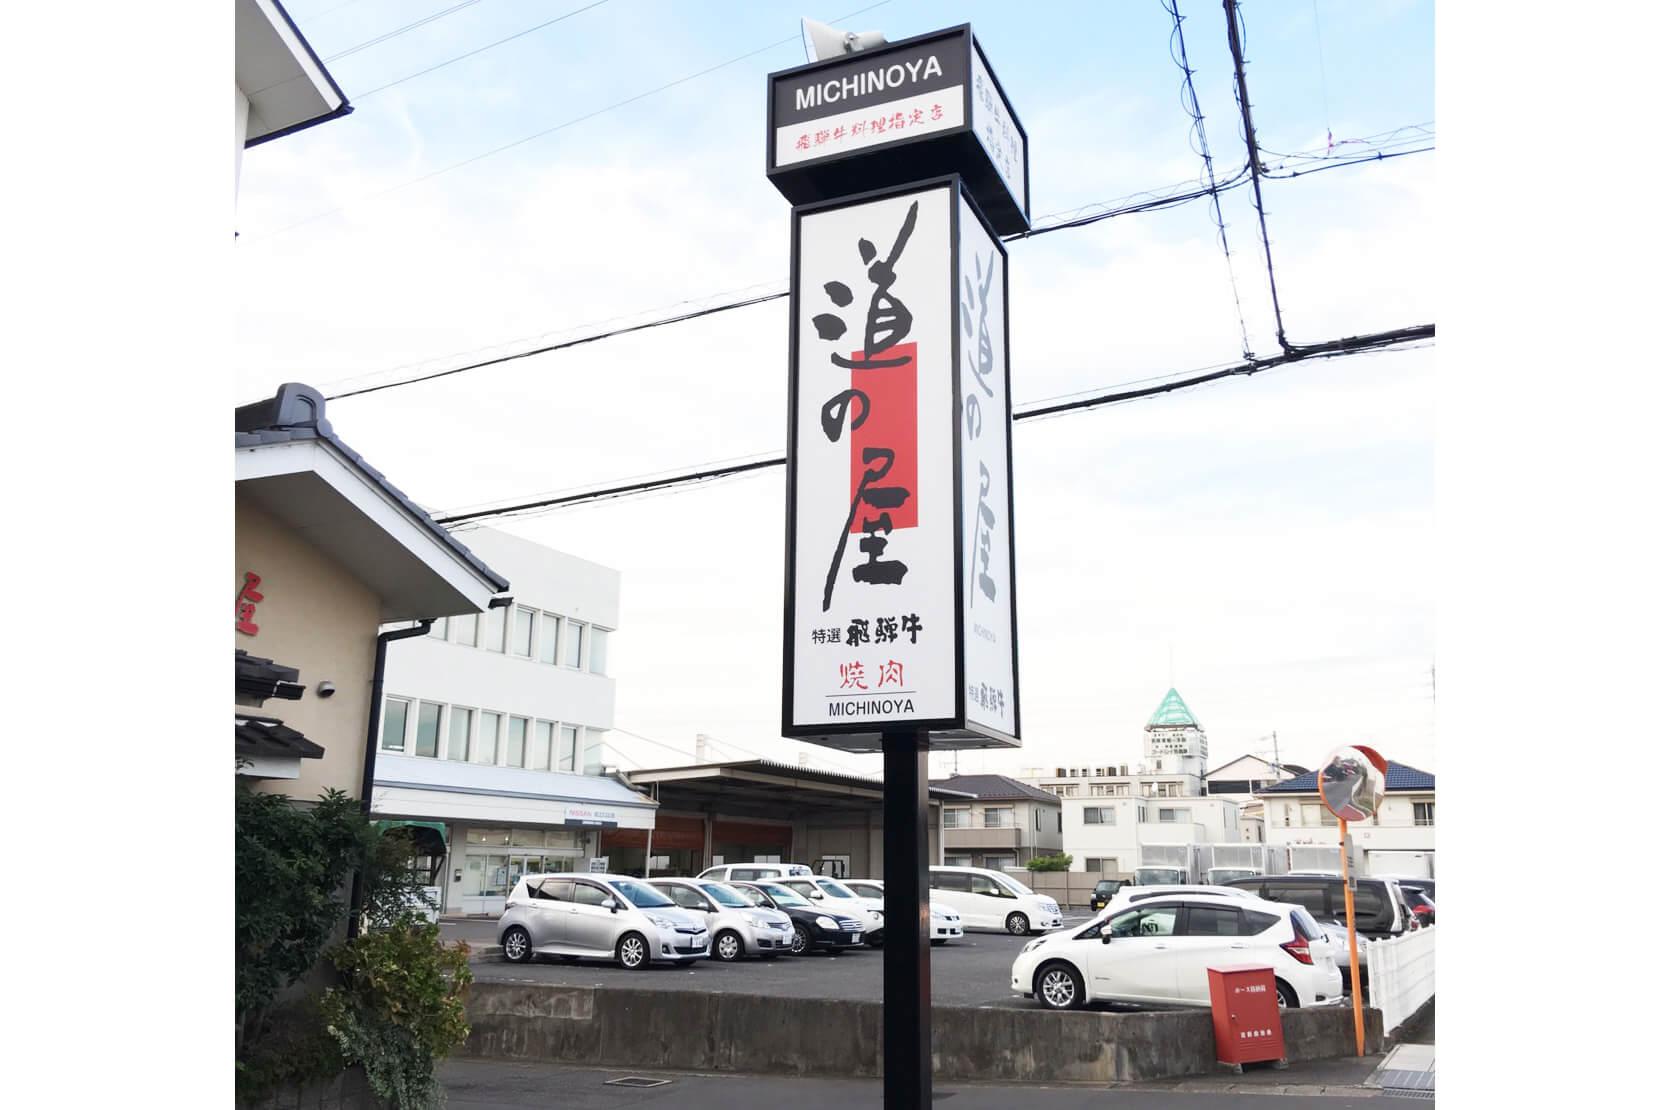 IMG 4276 - 【岐阜県各務原市】焼き肉_道の屋様の看板デザイン製作及び施工を担当させていただきました。